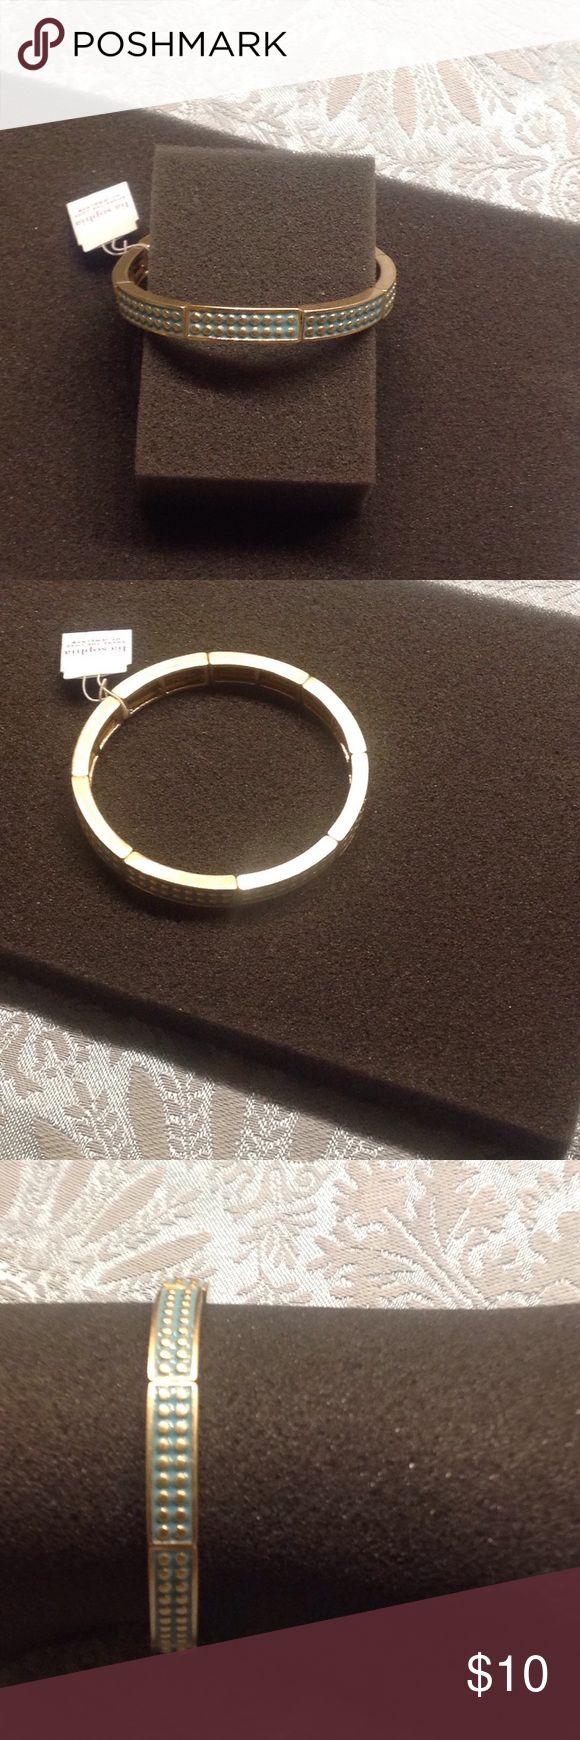 NWT Lia Sophia Swiss Dot  Teal/Gold Bracelet Sz Sm New Lia Sophia Teal w/Gold Stretch Bracelet. Fits small Lia Sophia Jewelry Bracelets